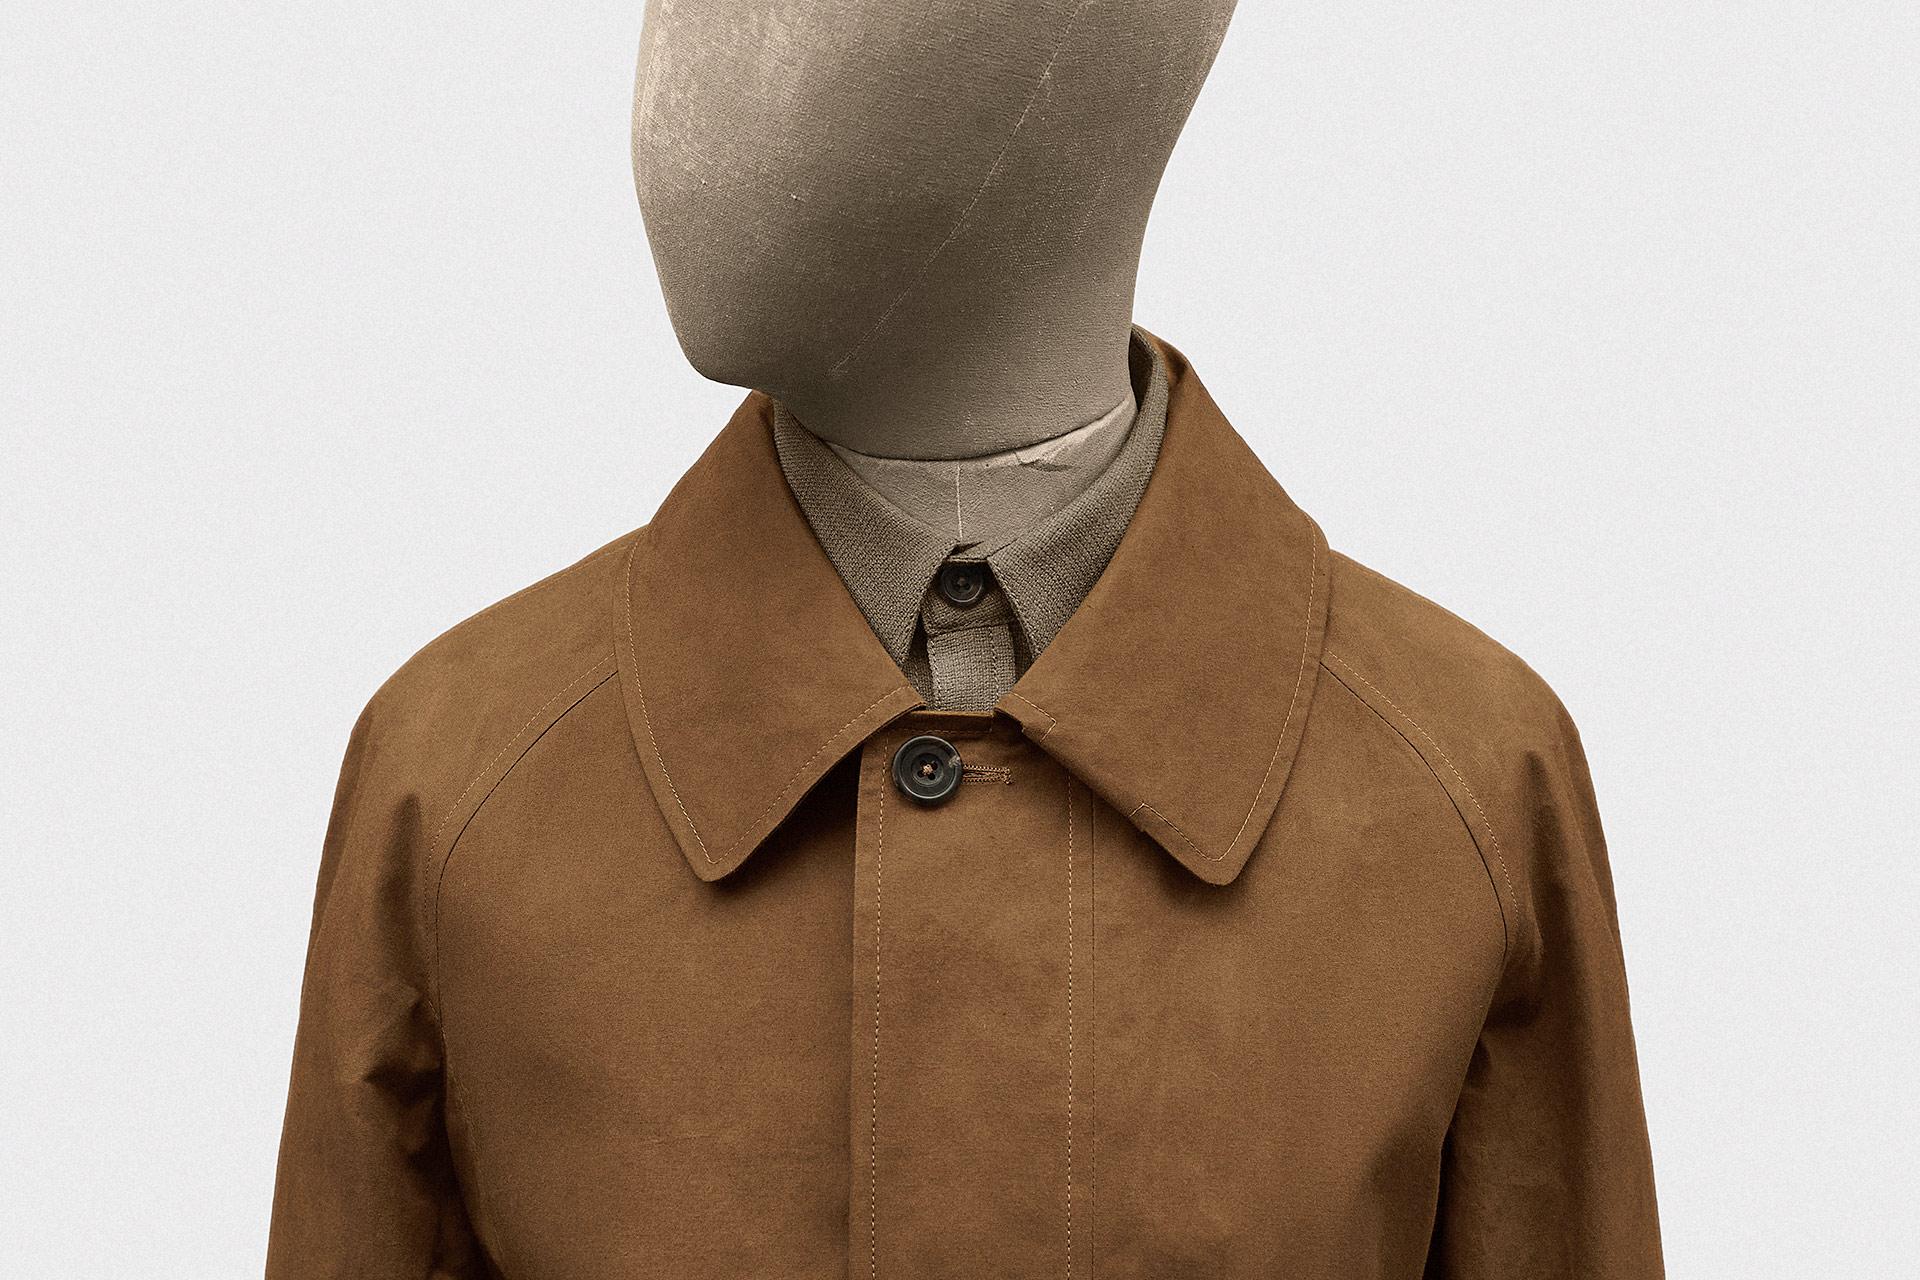 balmacaan-no-wax-cotton-copper-2@2x.jpg